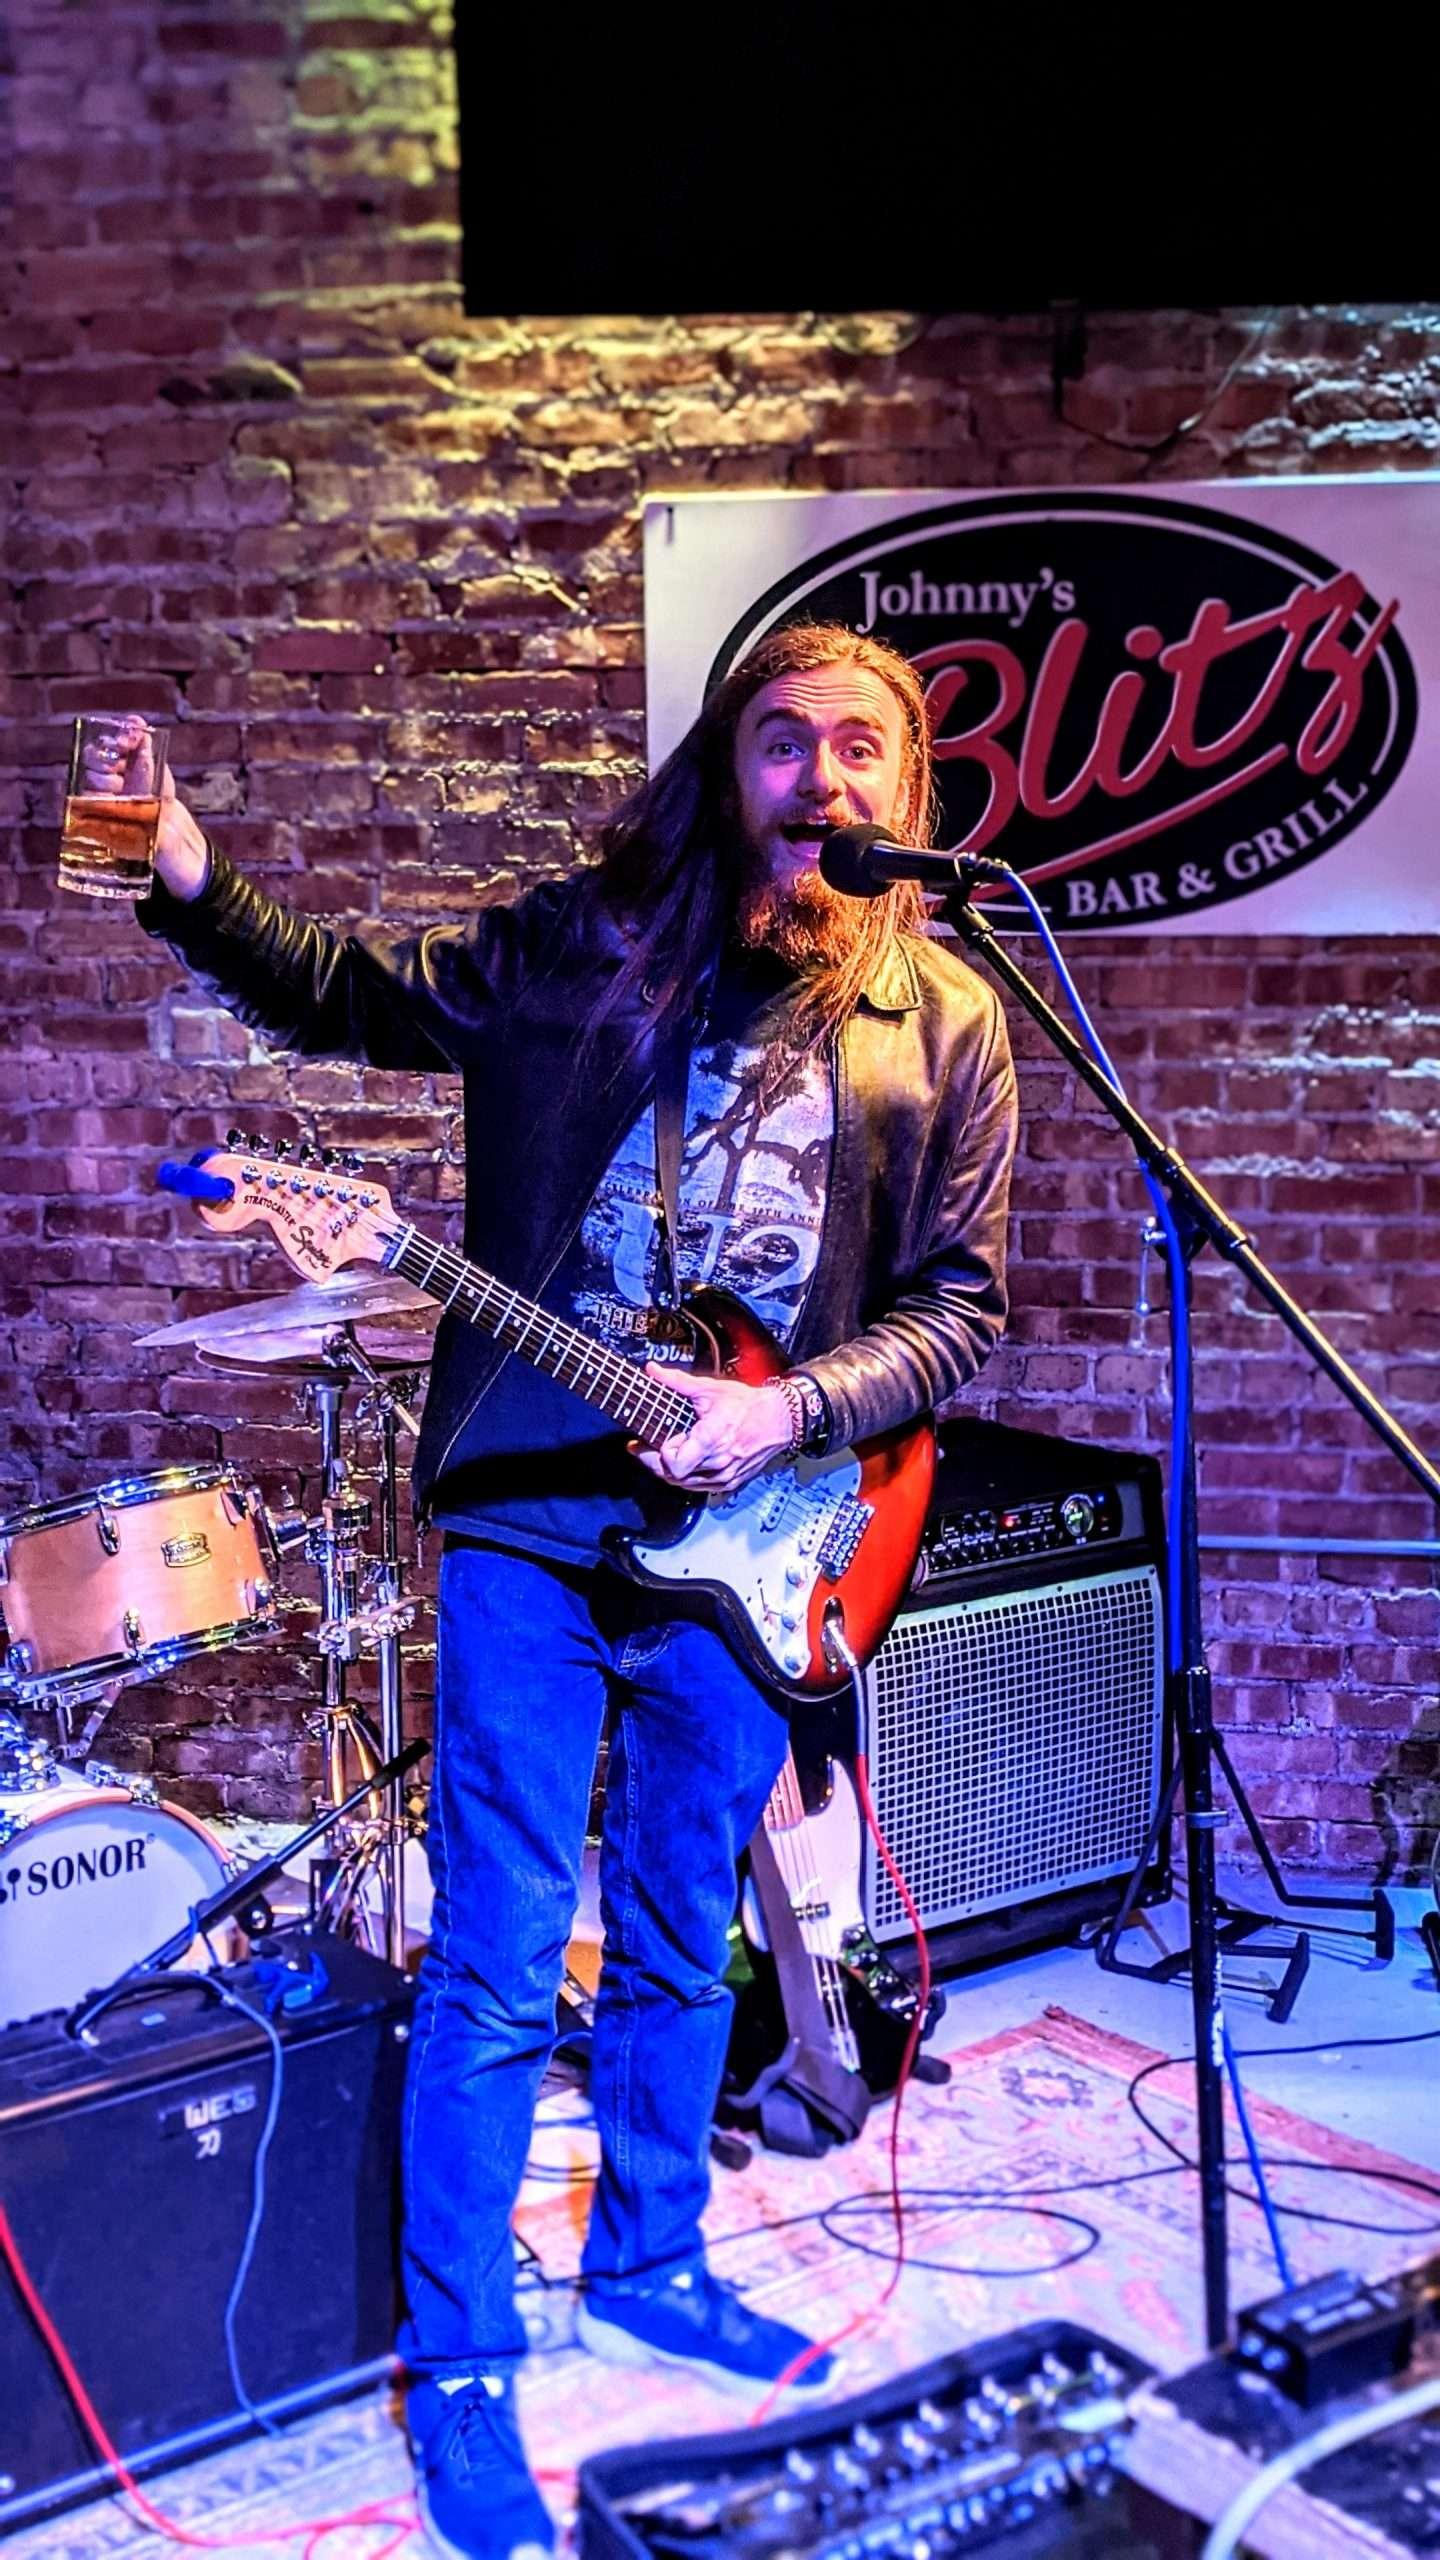 Brian's Open Mic Experiences At Johnny's Blitz Bar & Grill 58